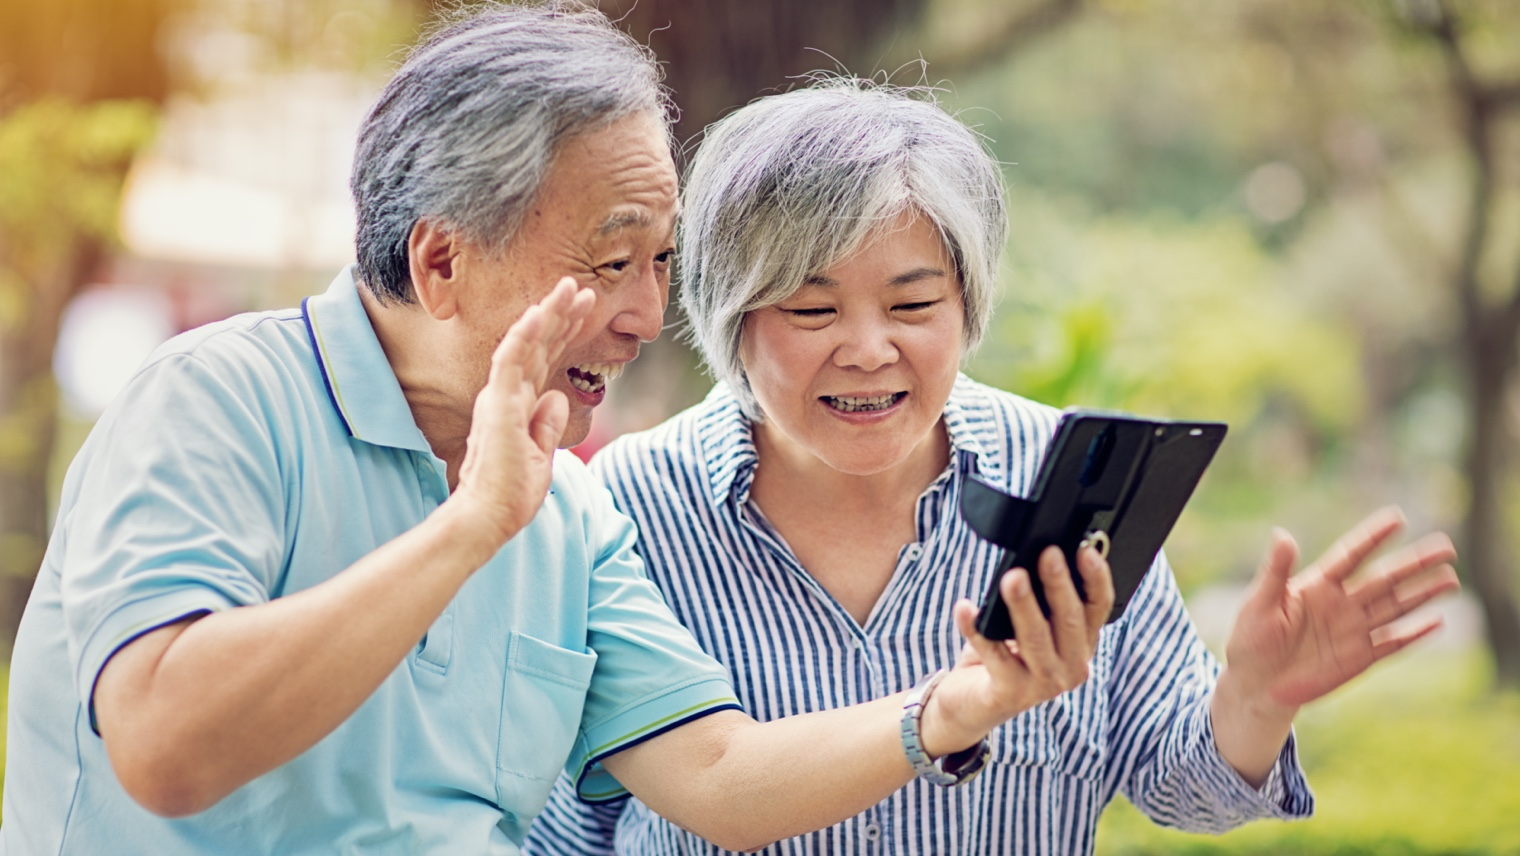 5G will enhance video calling